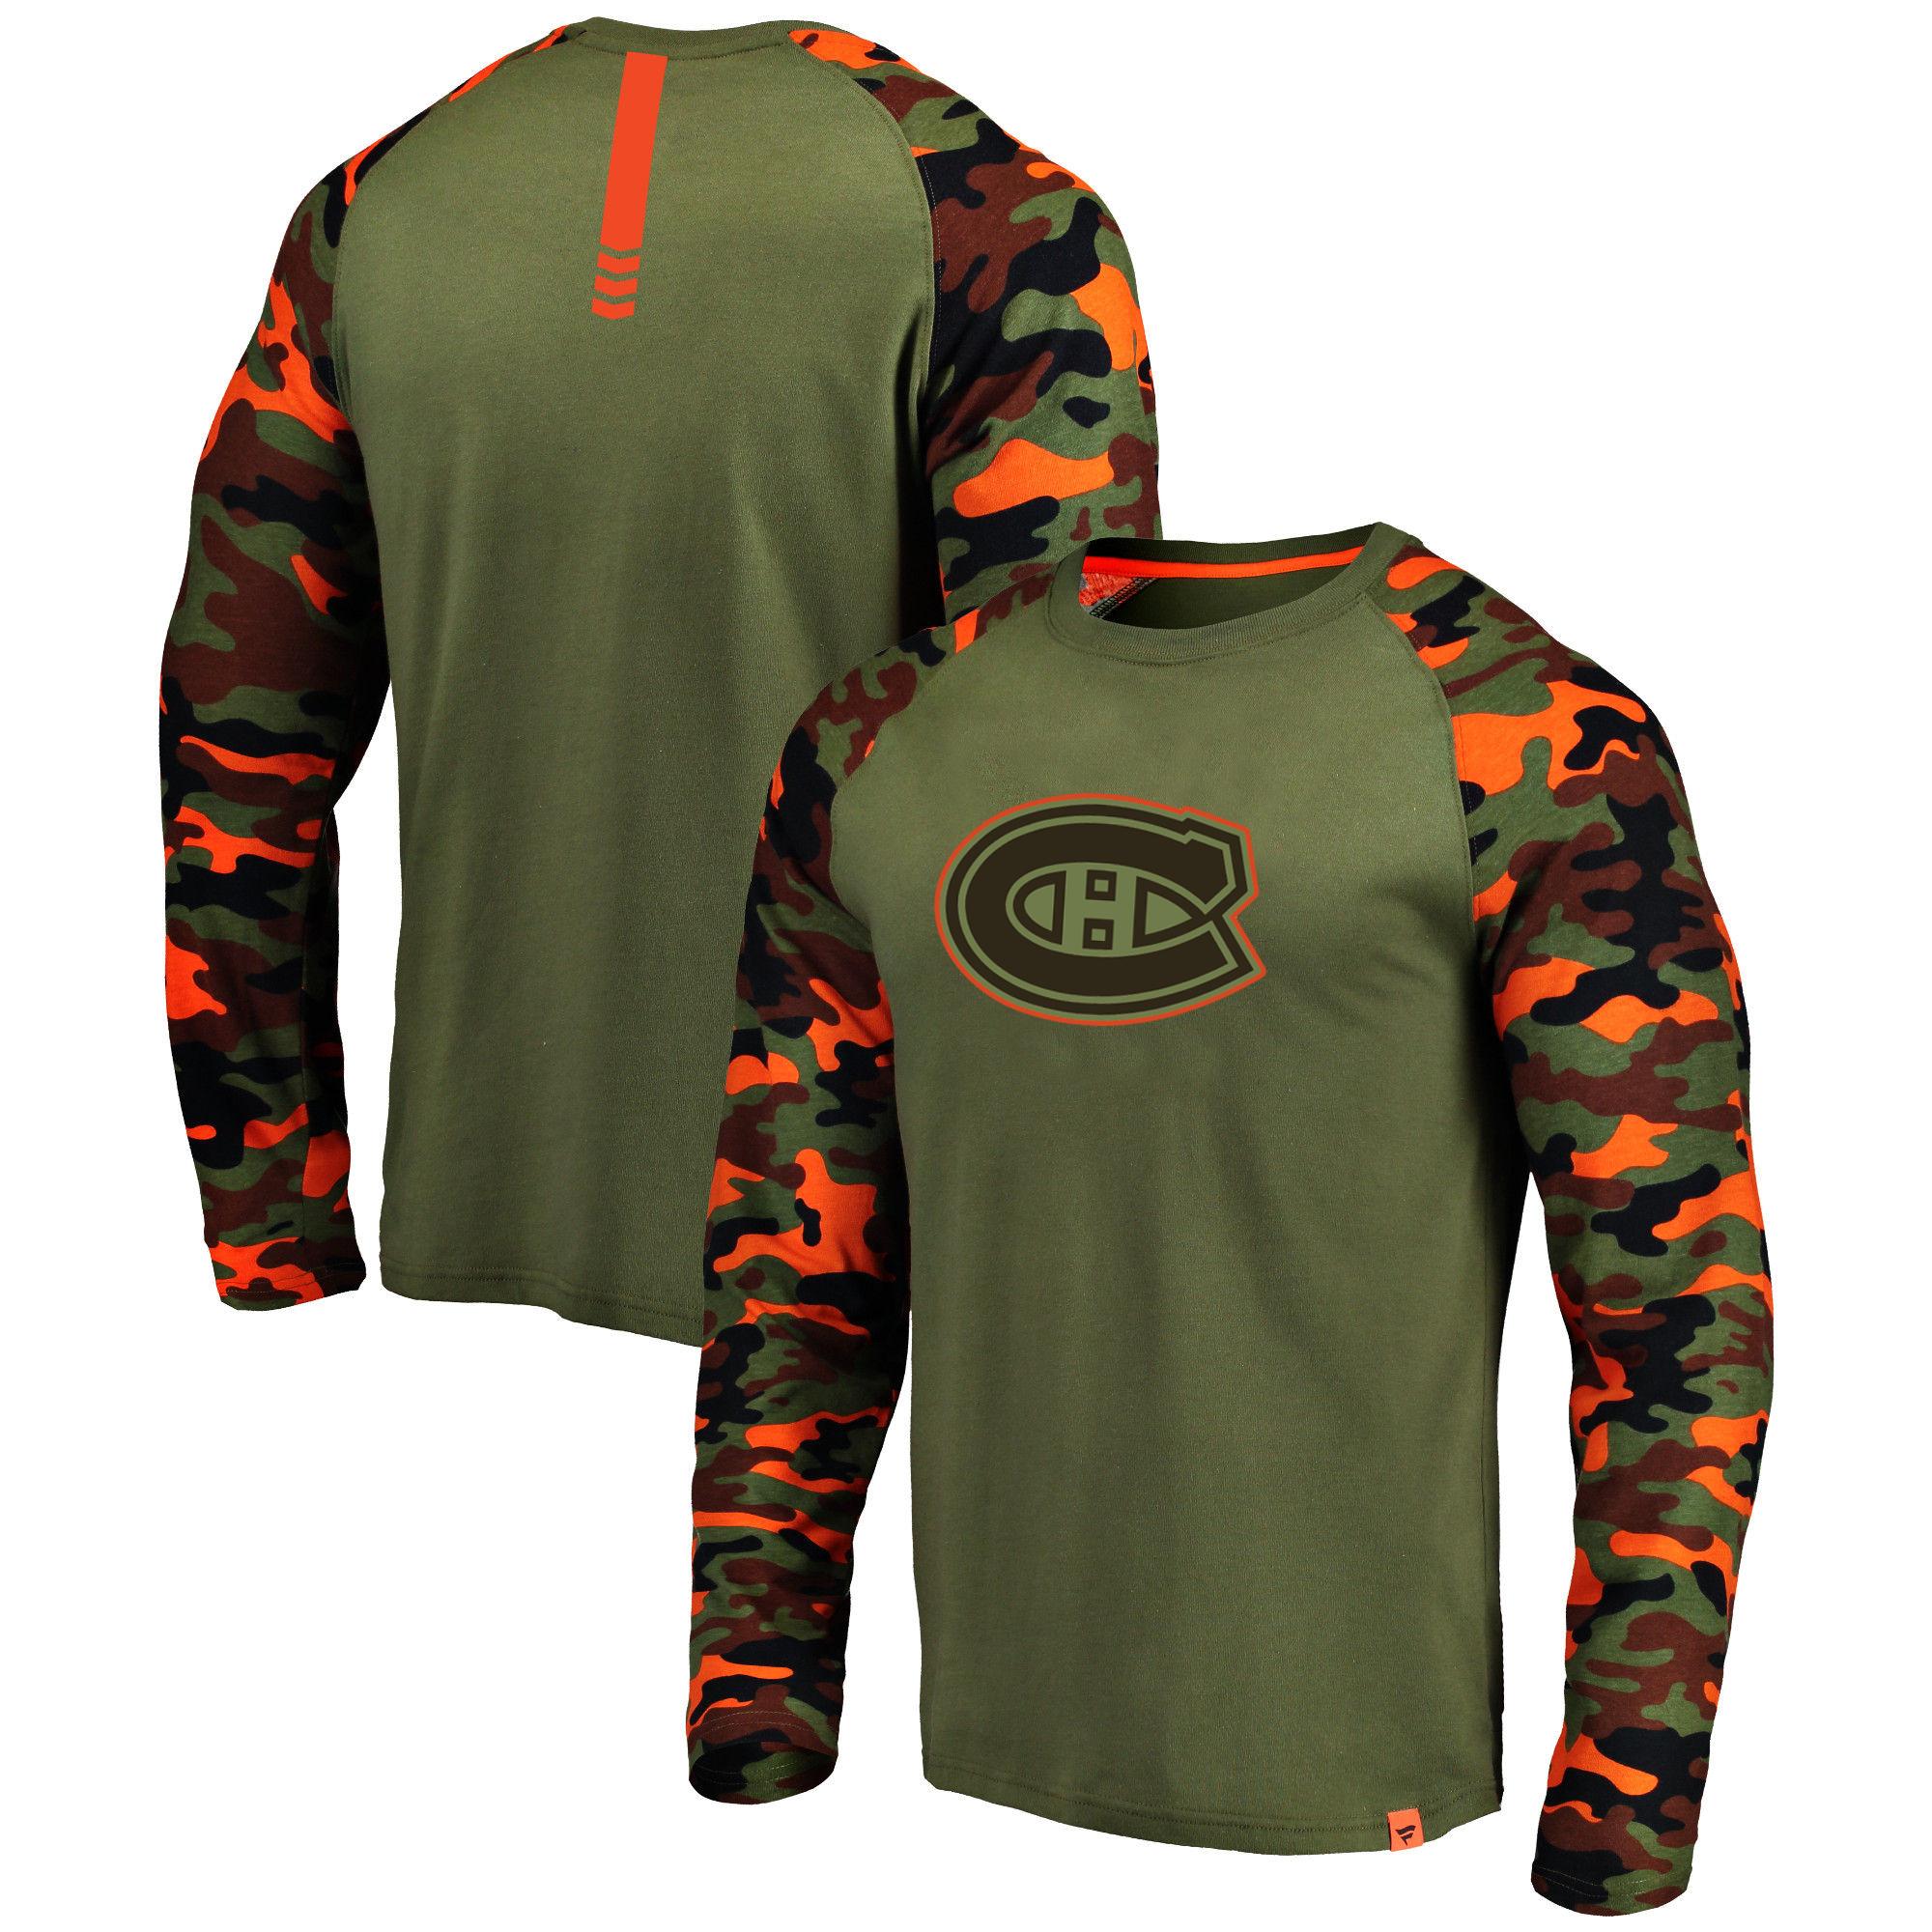 Montreal Canadiens Fanatics Branded Olive/Camo Recon Long Sleeve Raglan T-Shirt